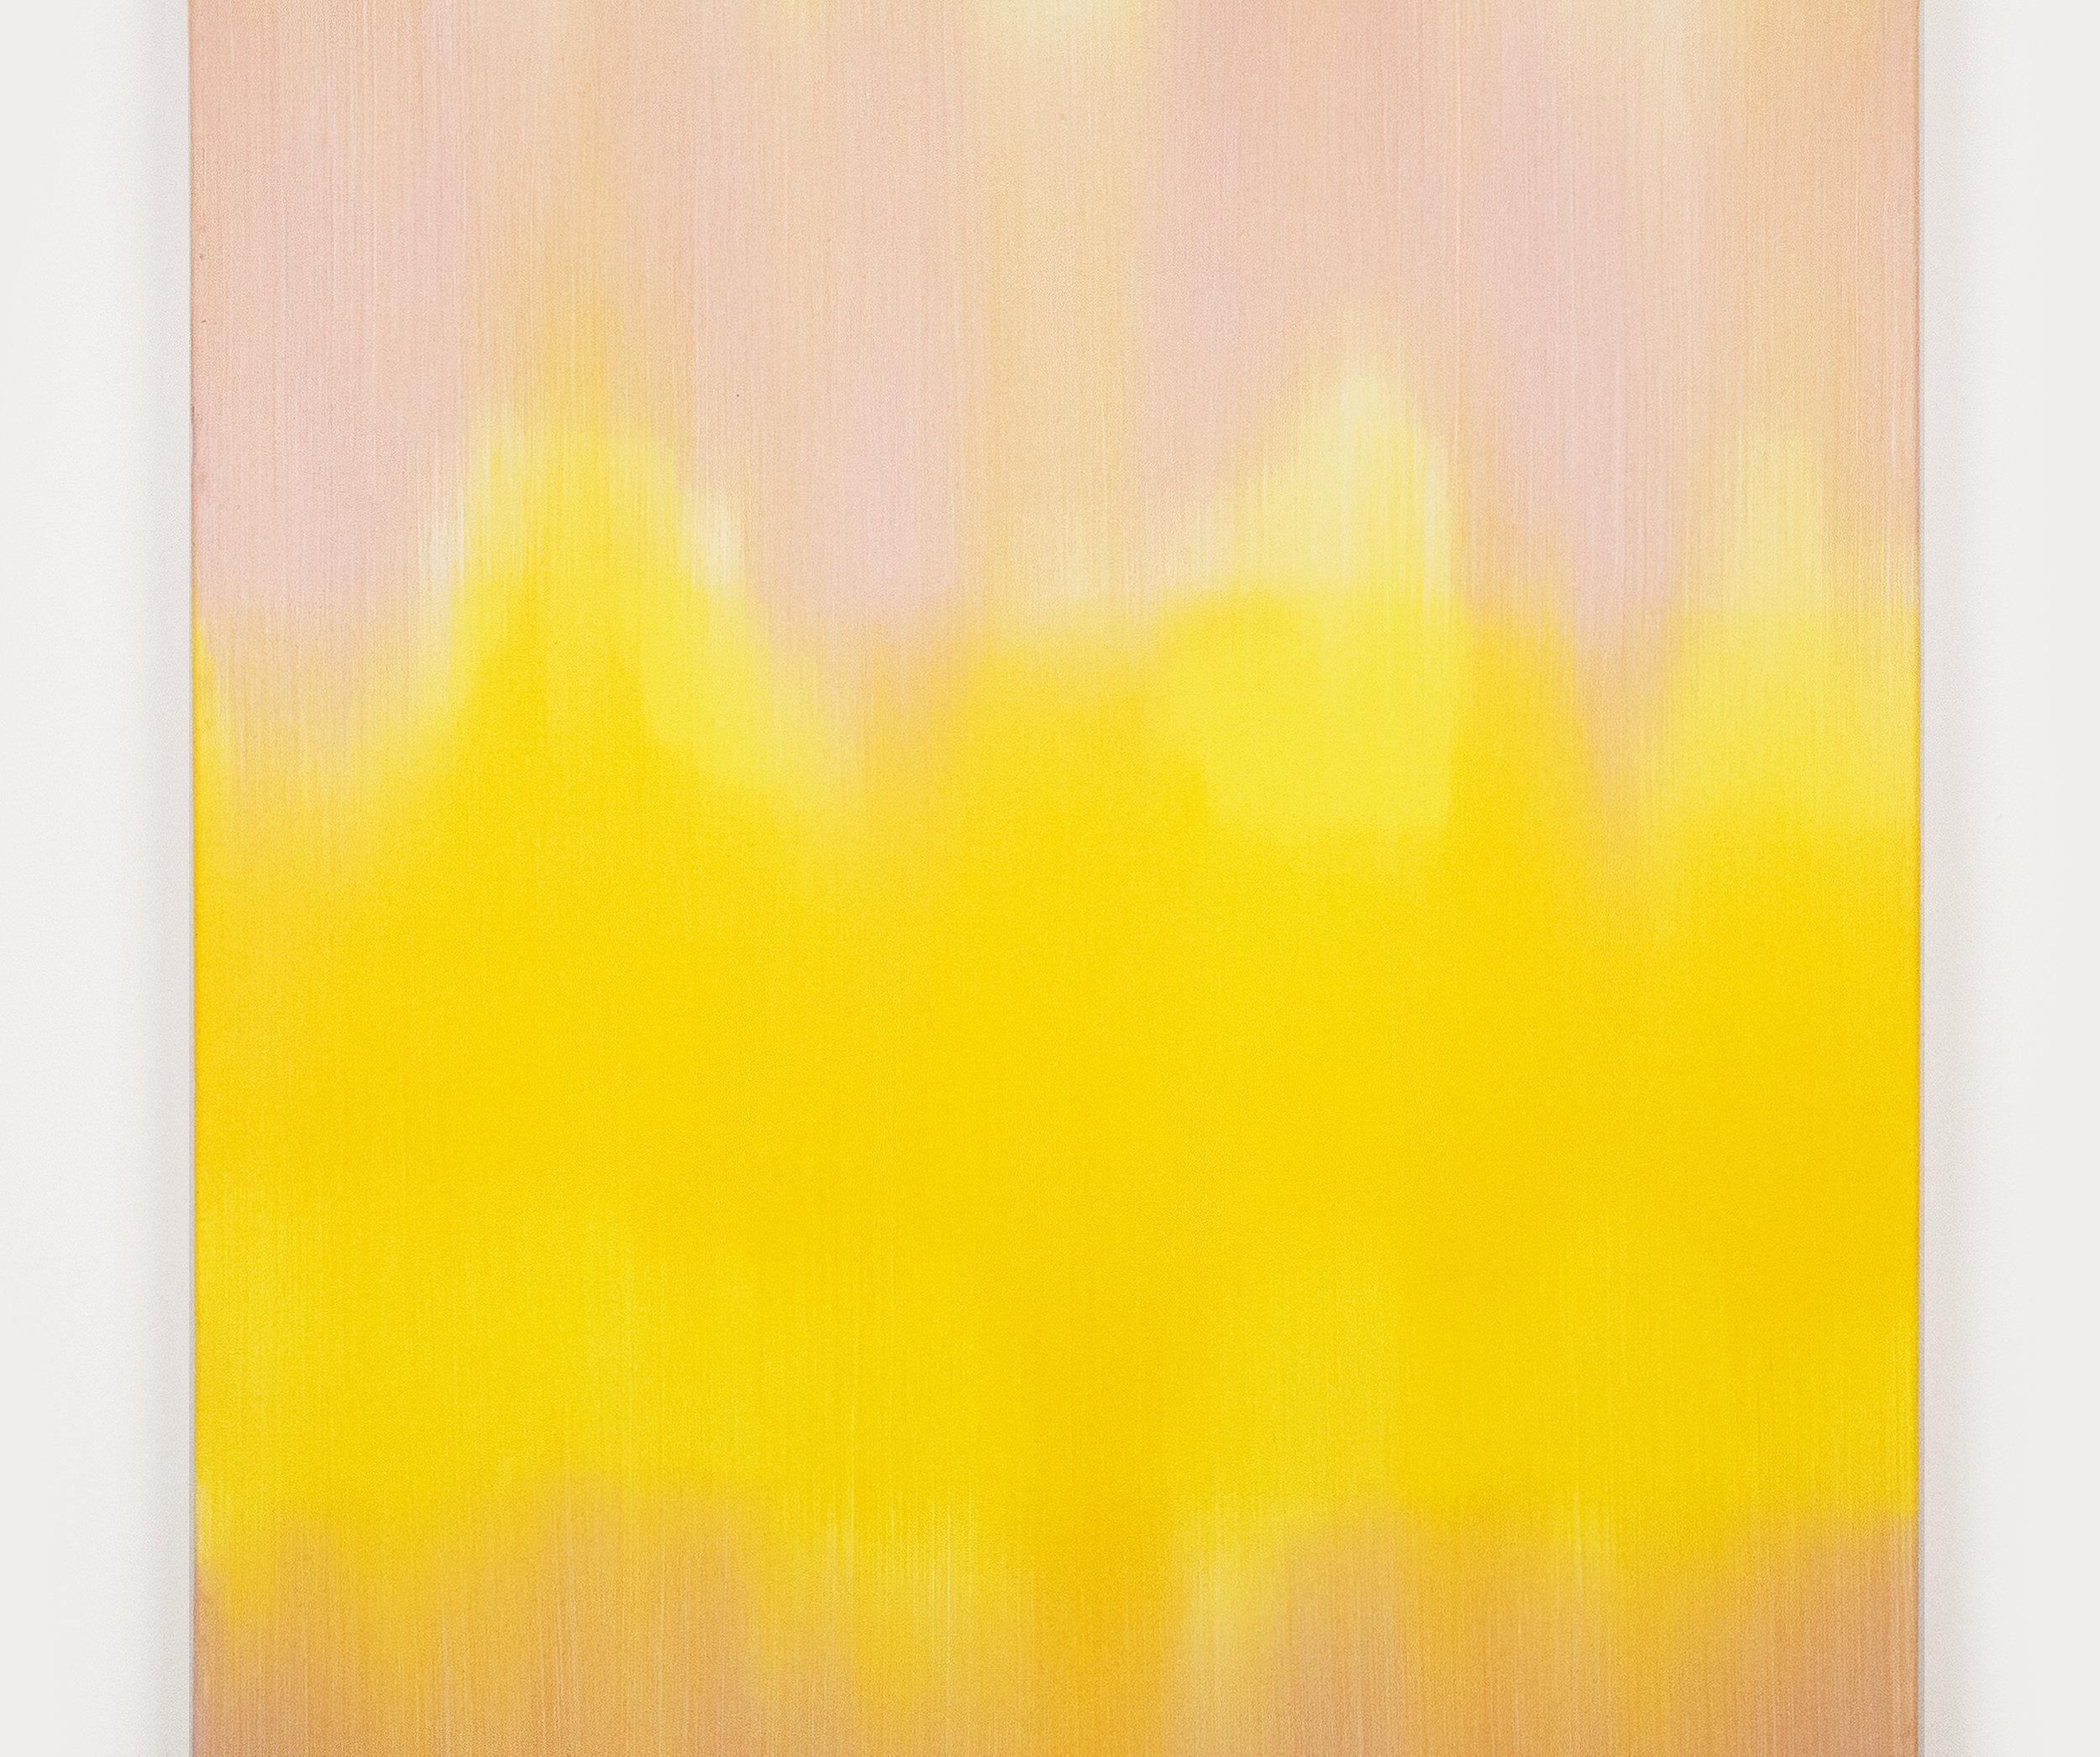 Amarelo2_2.jpg